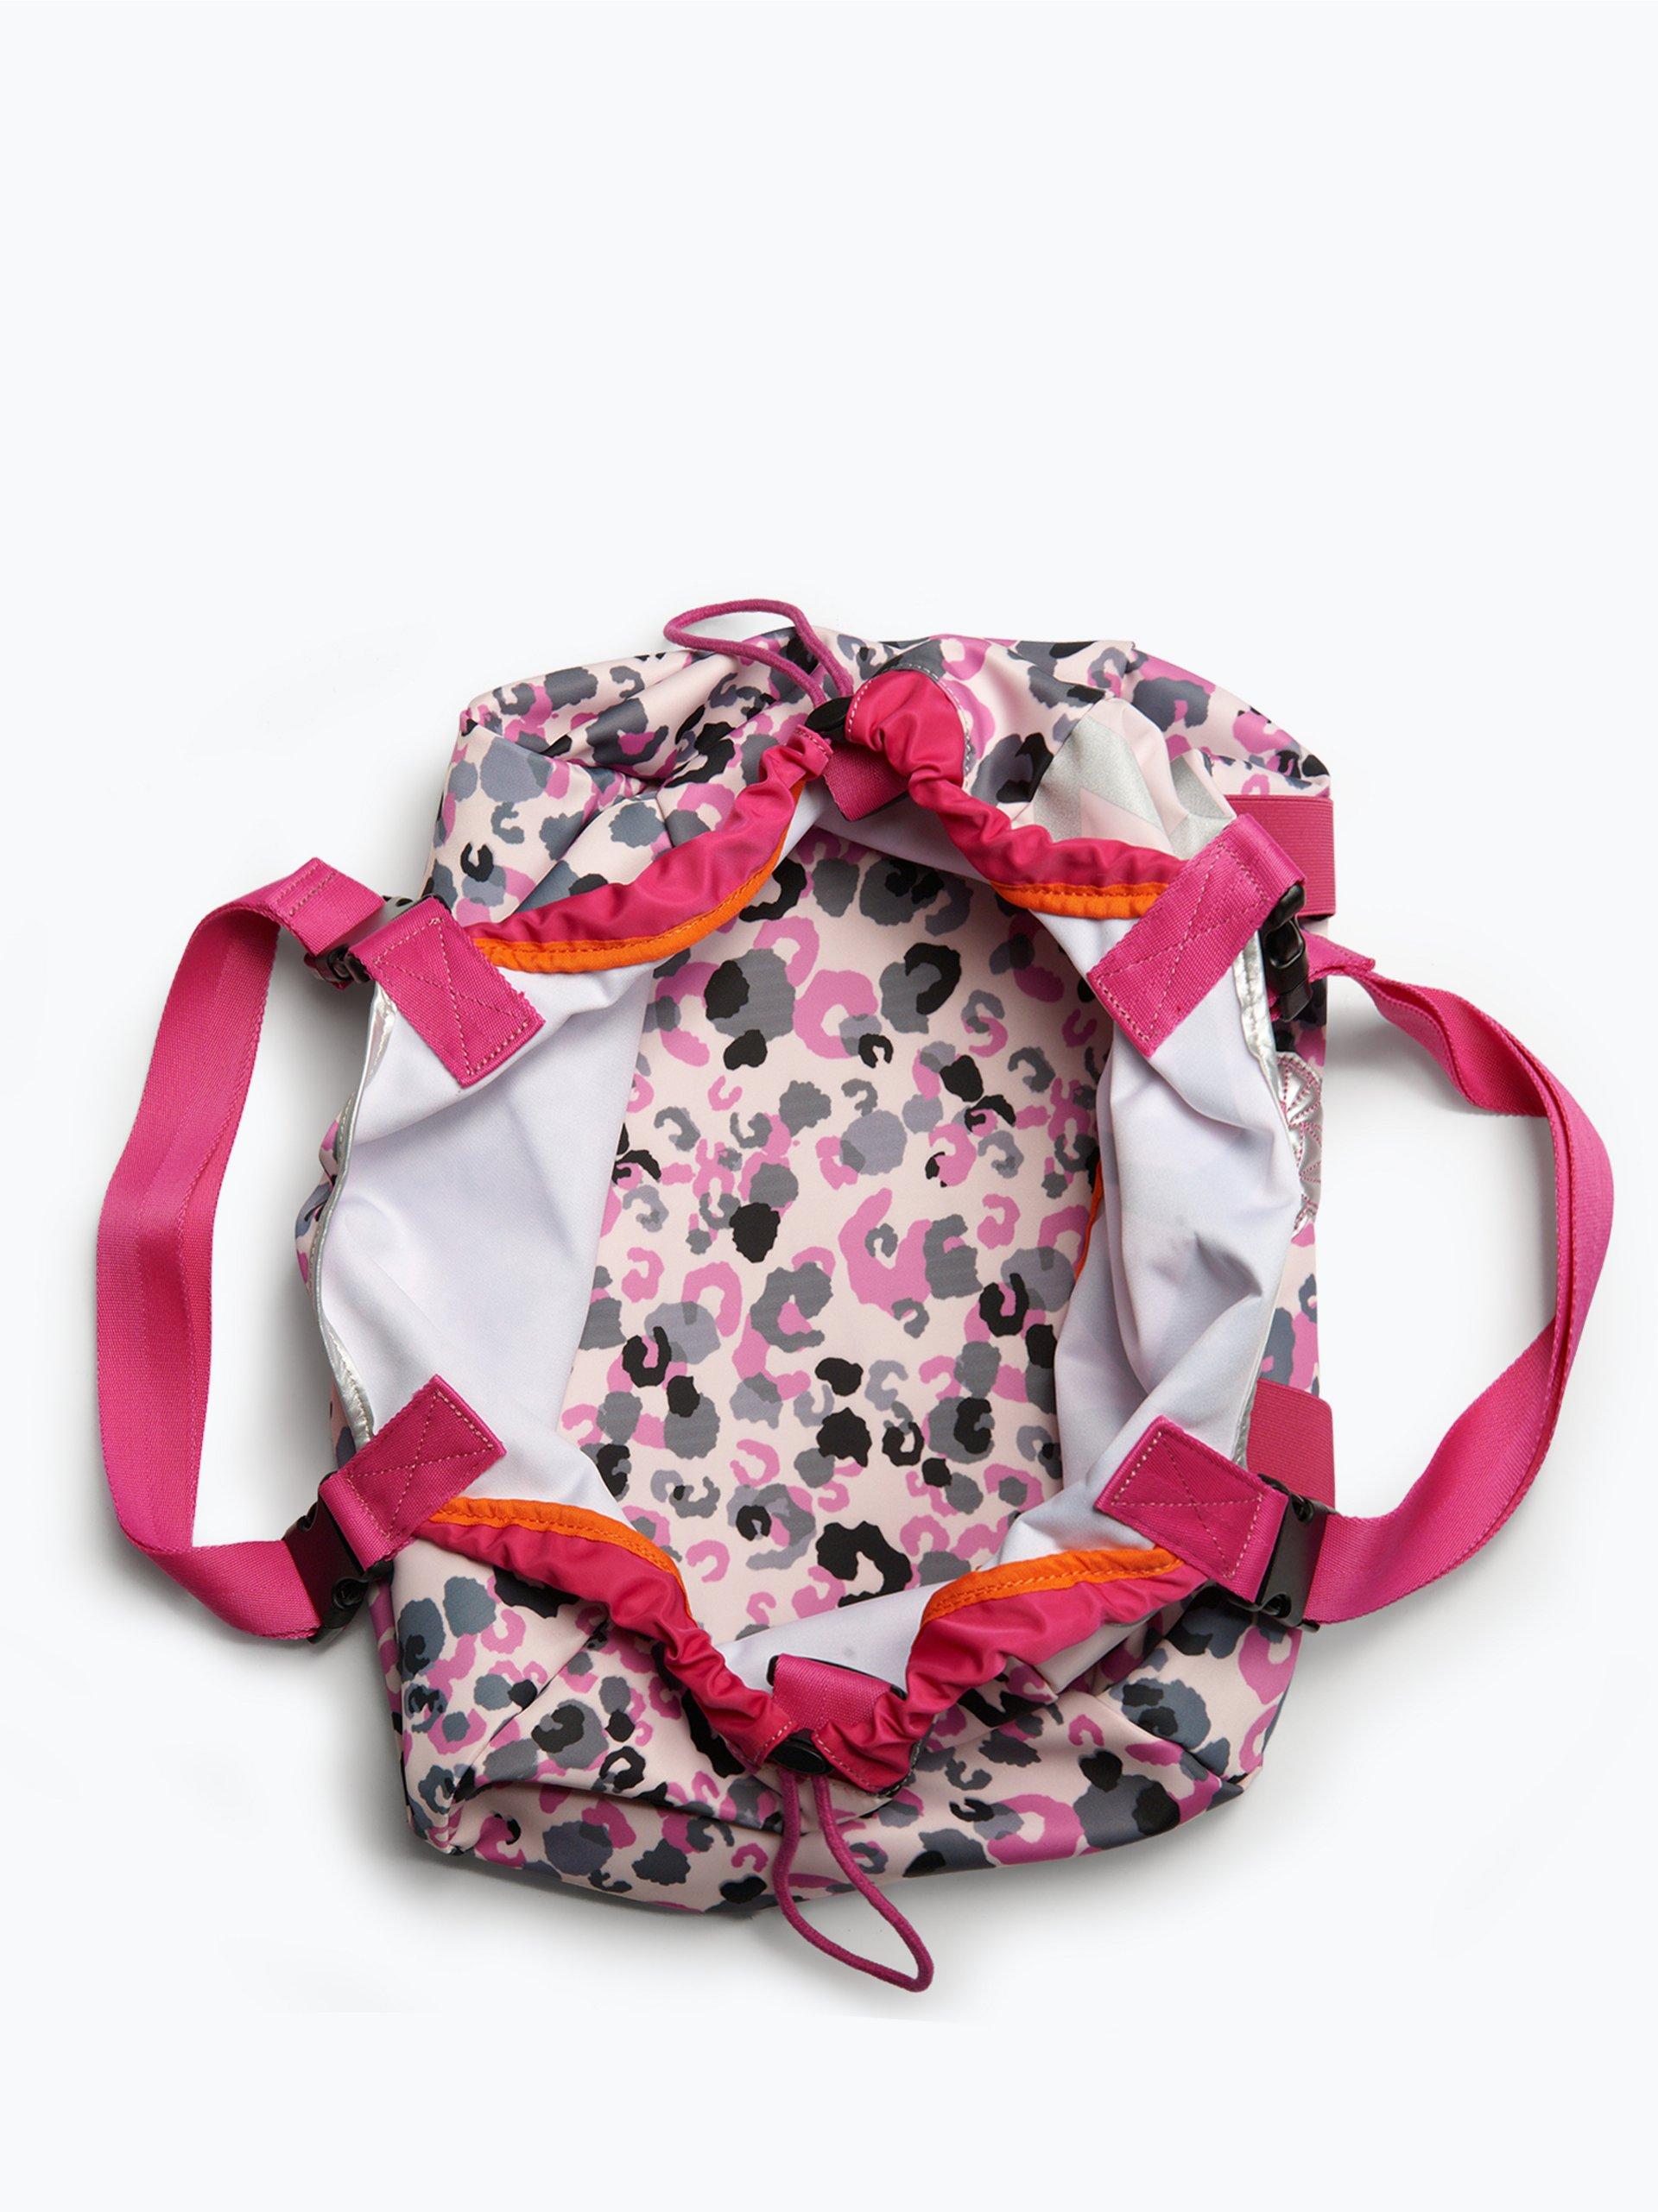 marc cain bags shoes damen tasche 2 online kaufen peek und cloppenburg de. Black Bedroom Furniture Sets. Home Design Ideas